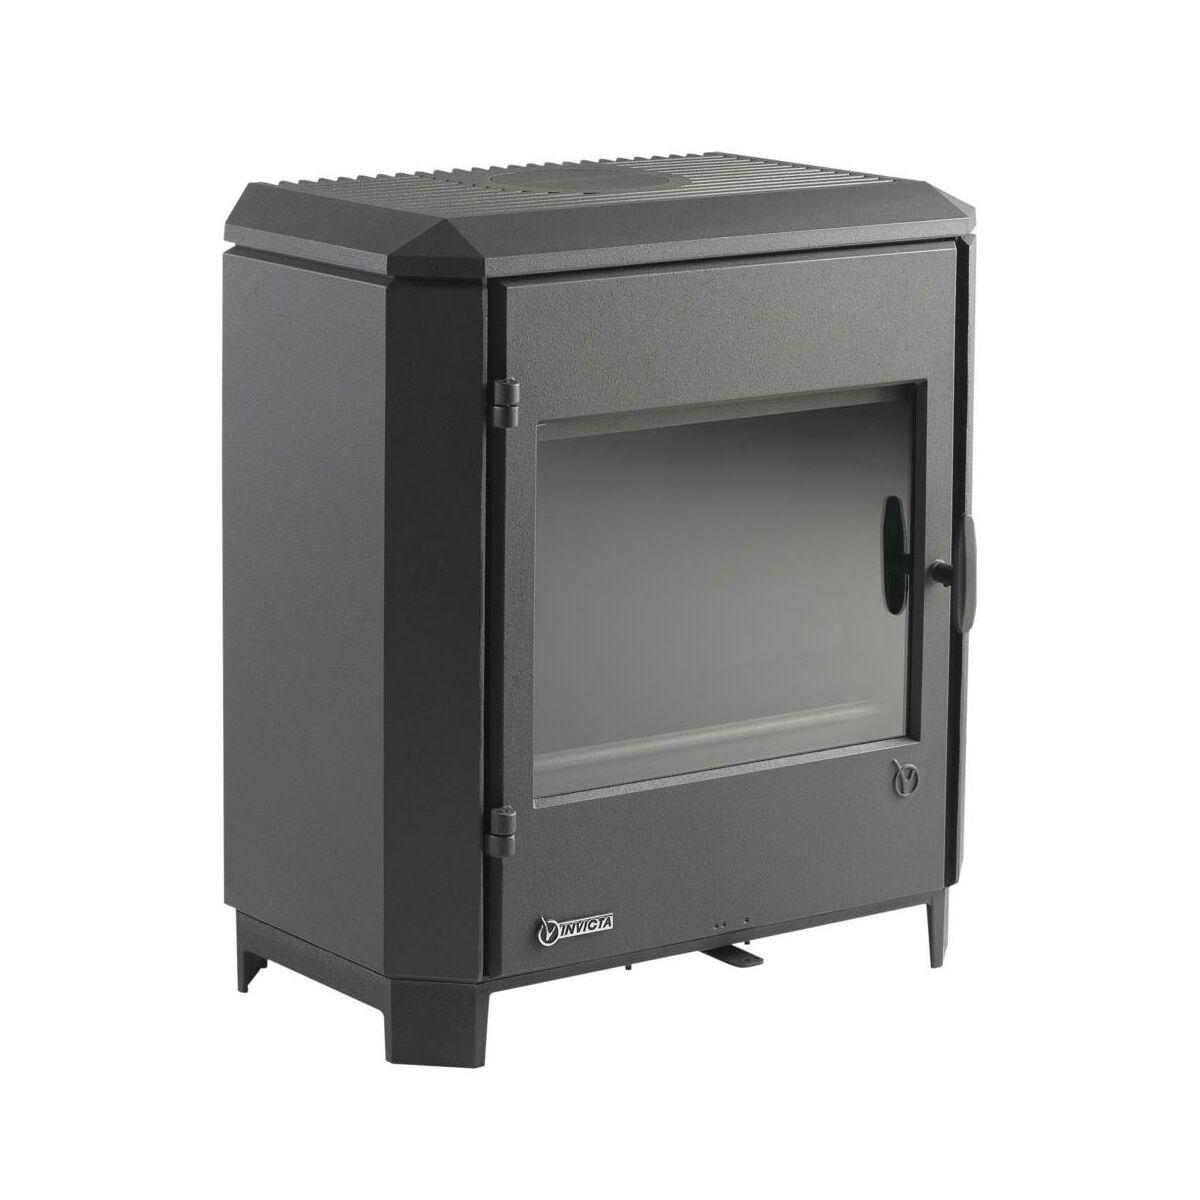 piec kominkowy carolo invicta piece kominkowe w. Black Bedroom Furniture Sets. Home Design Ideas